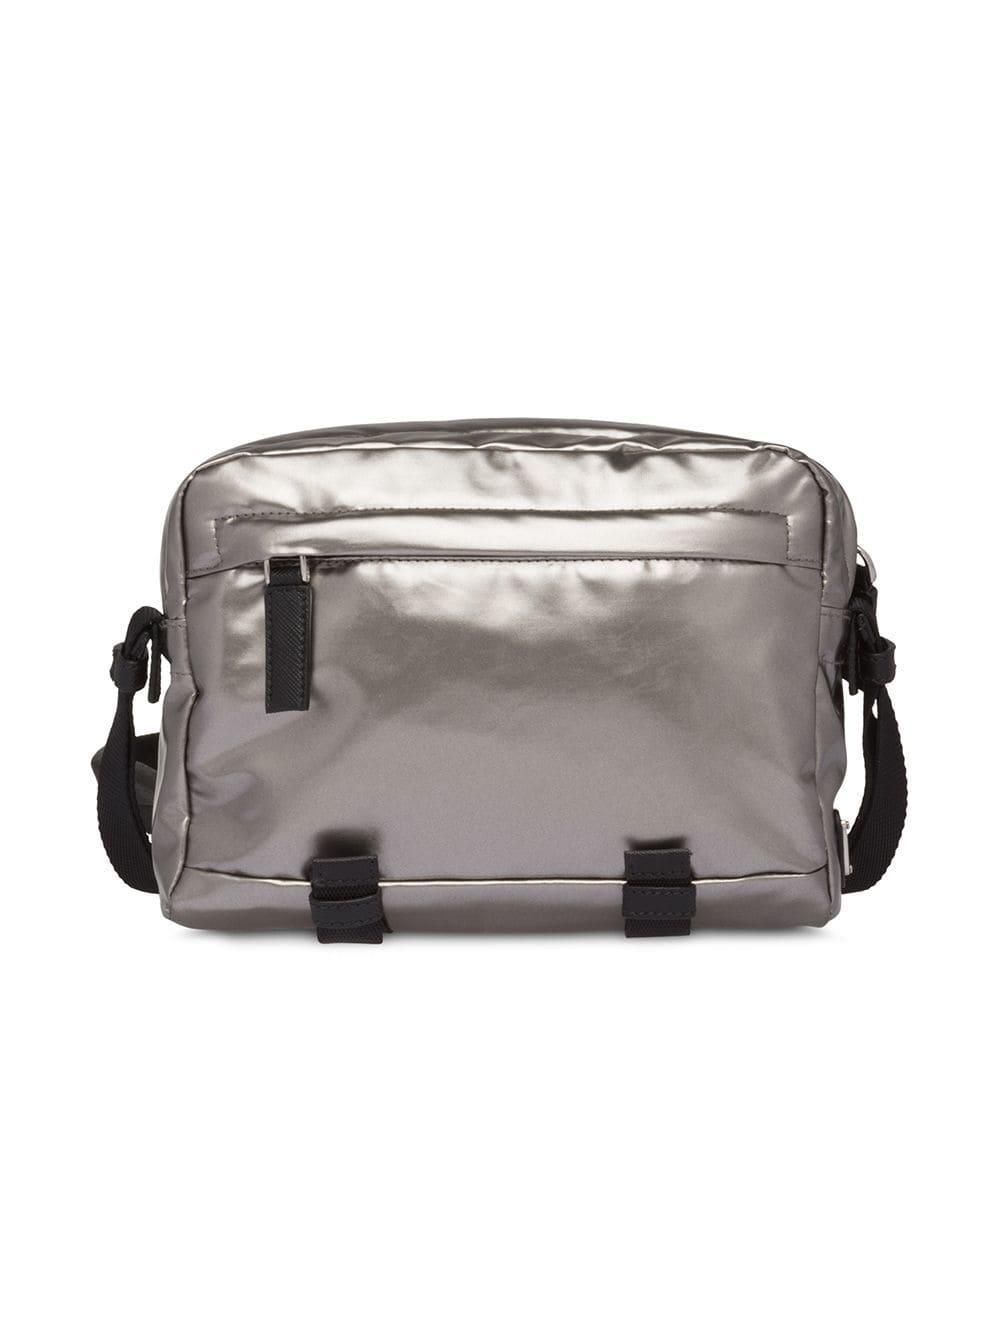 5e7b806b8337c5 Prada Technical Fabric Messenger Bag in Metallic for Men - Save 24% - Lyst